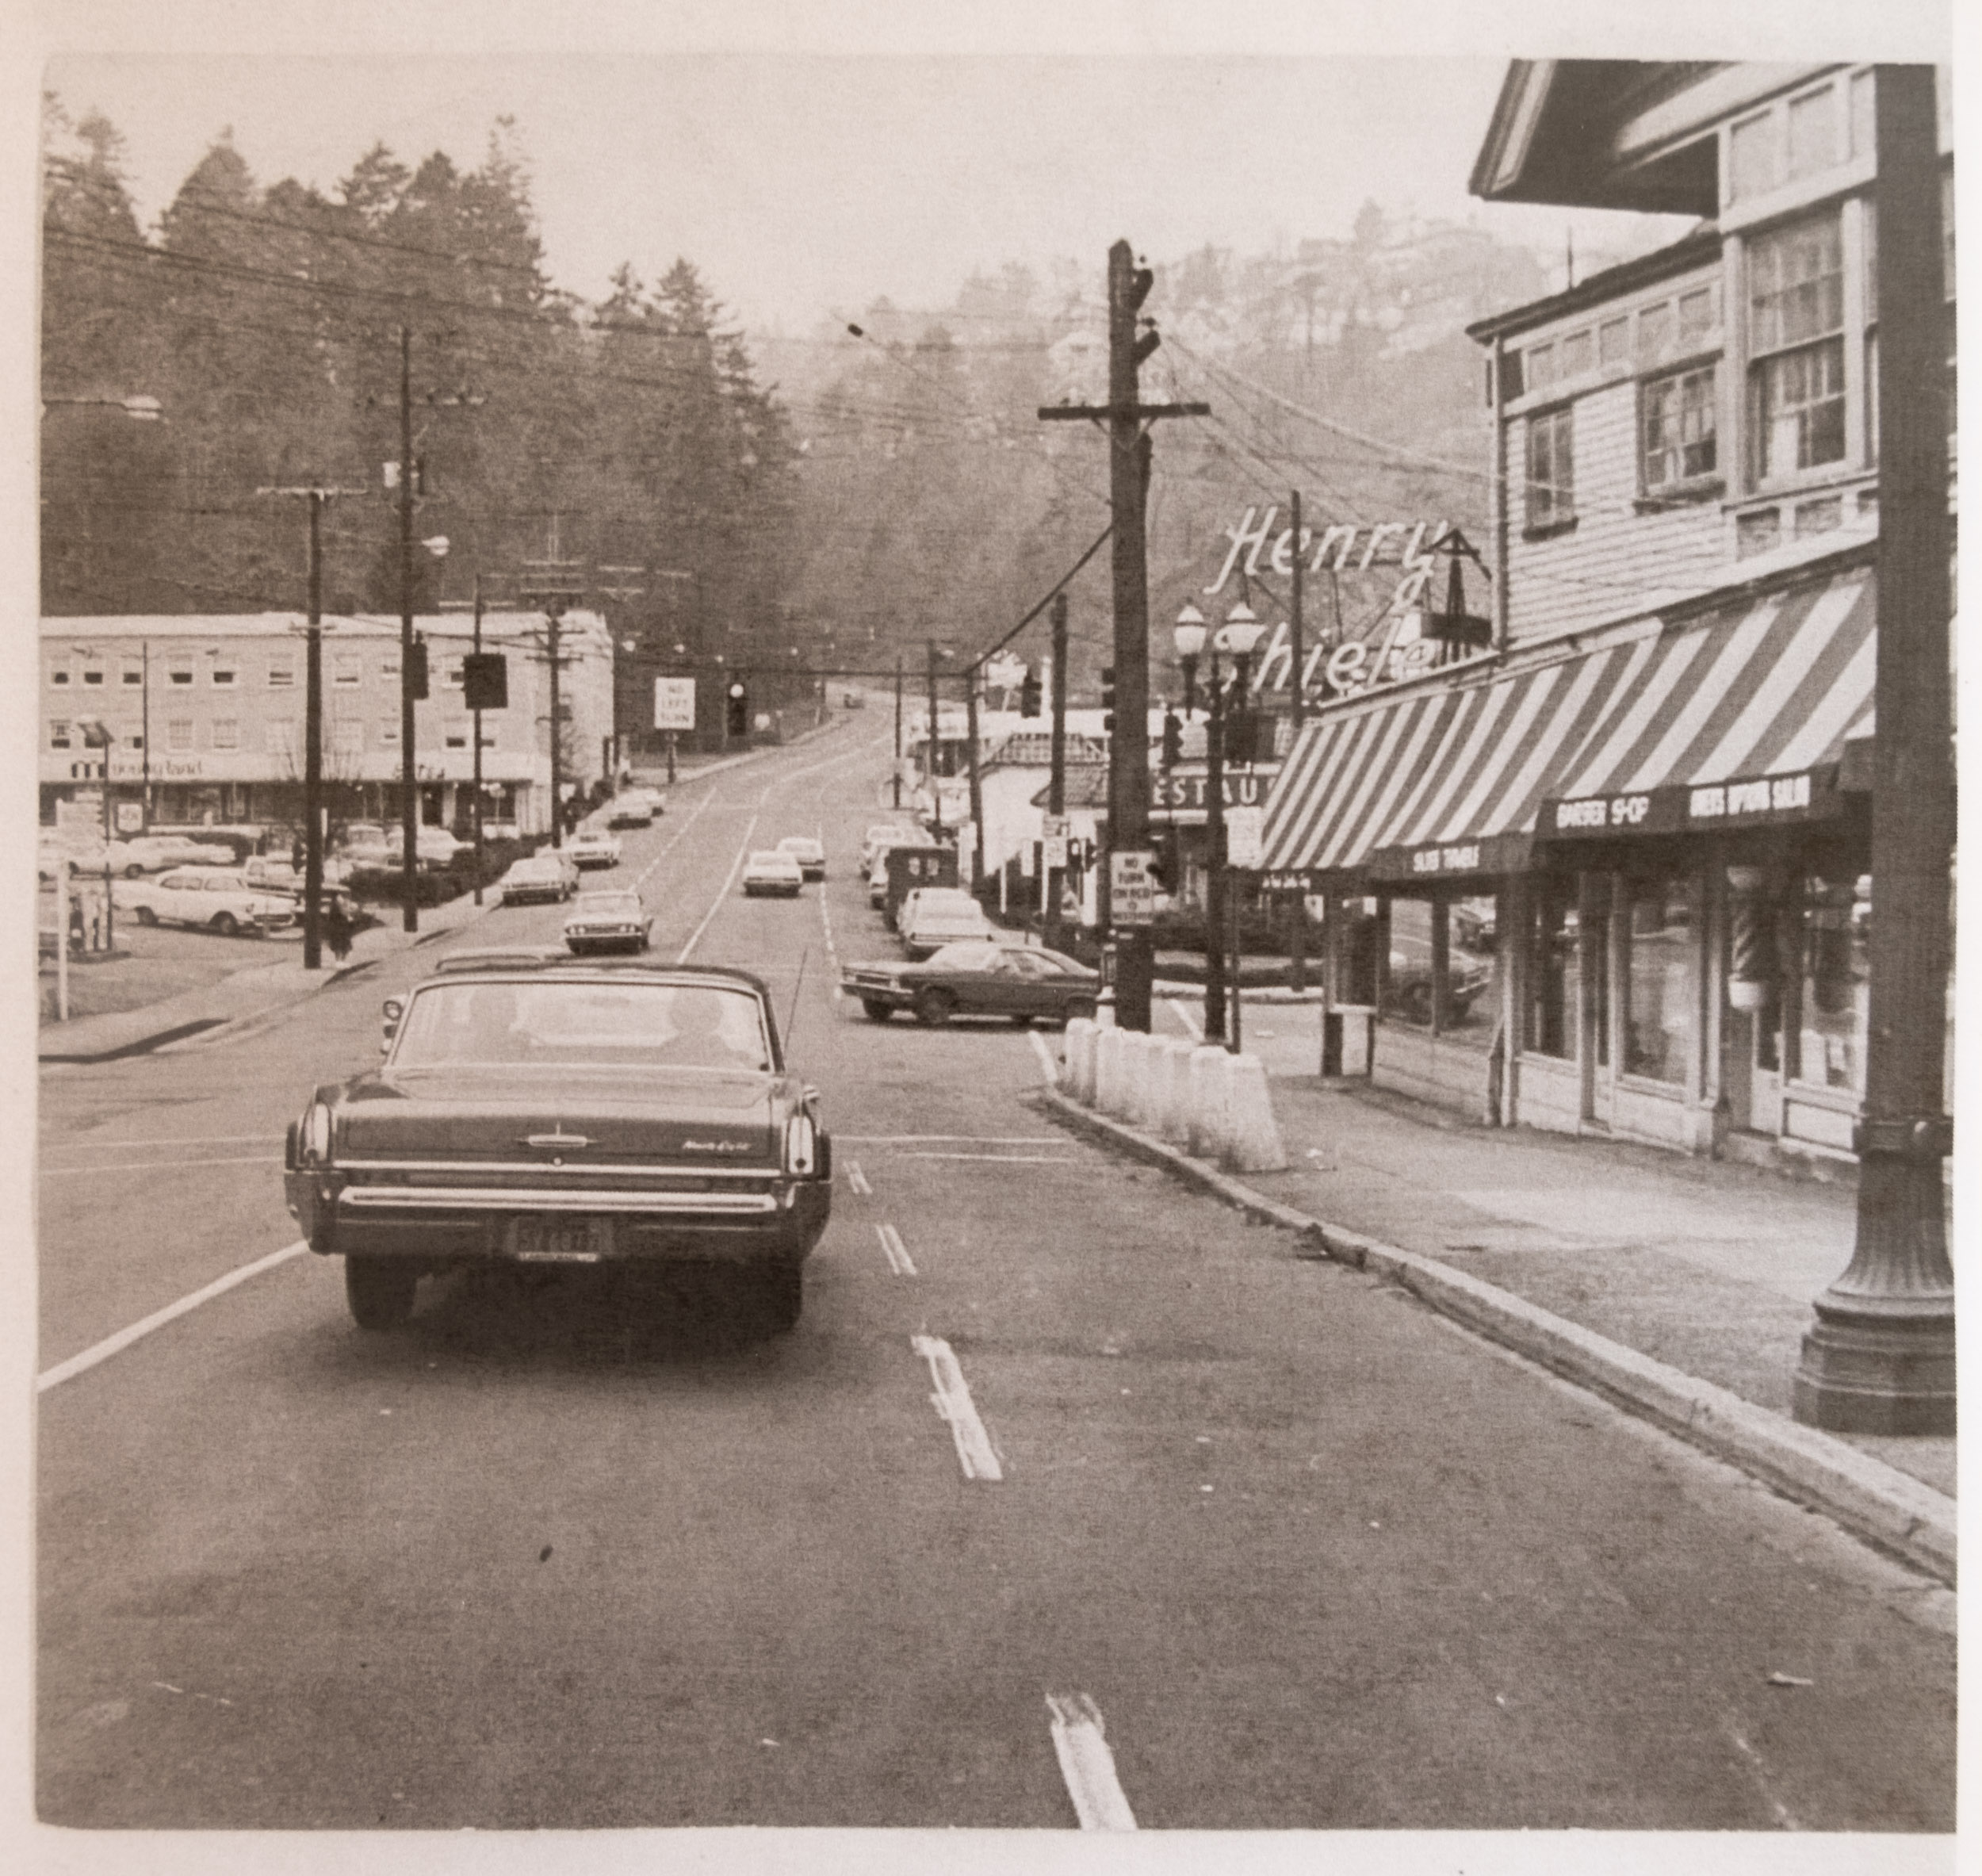 Similar view, 1967